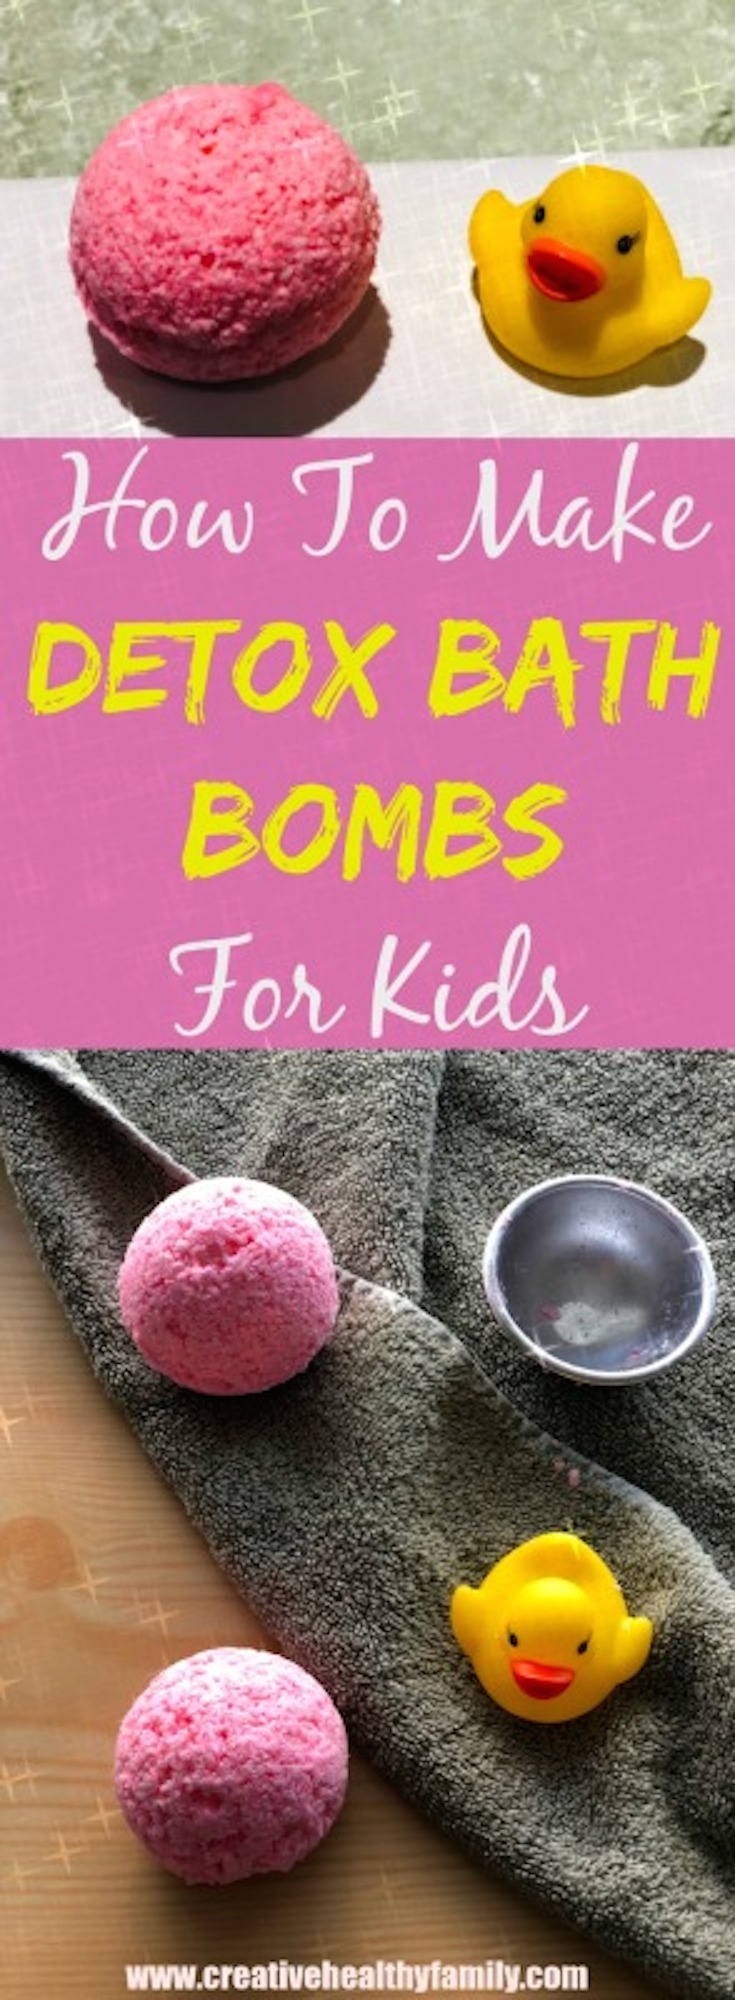 Detox bath bombs for kids